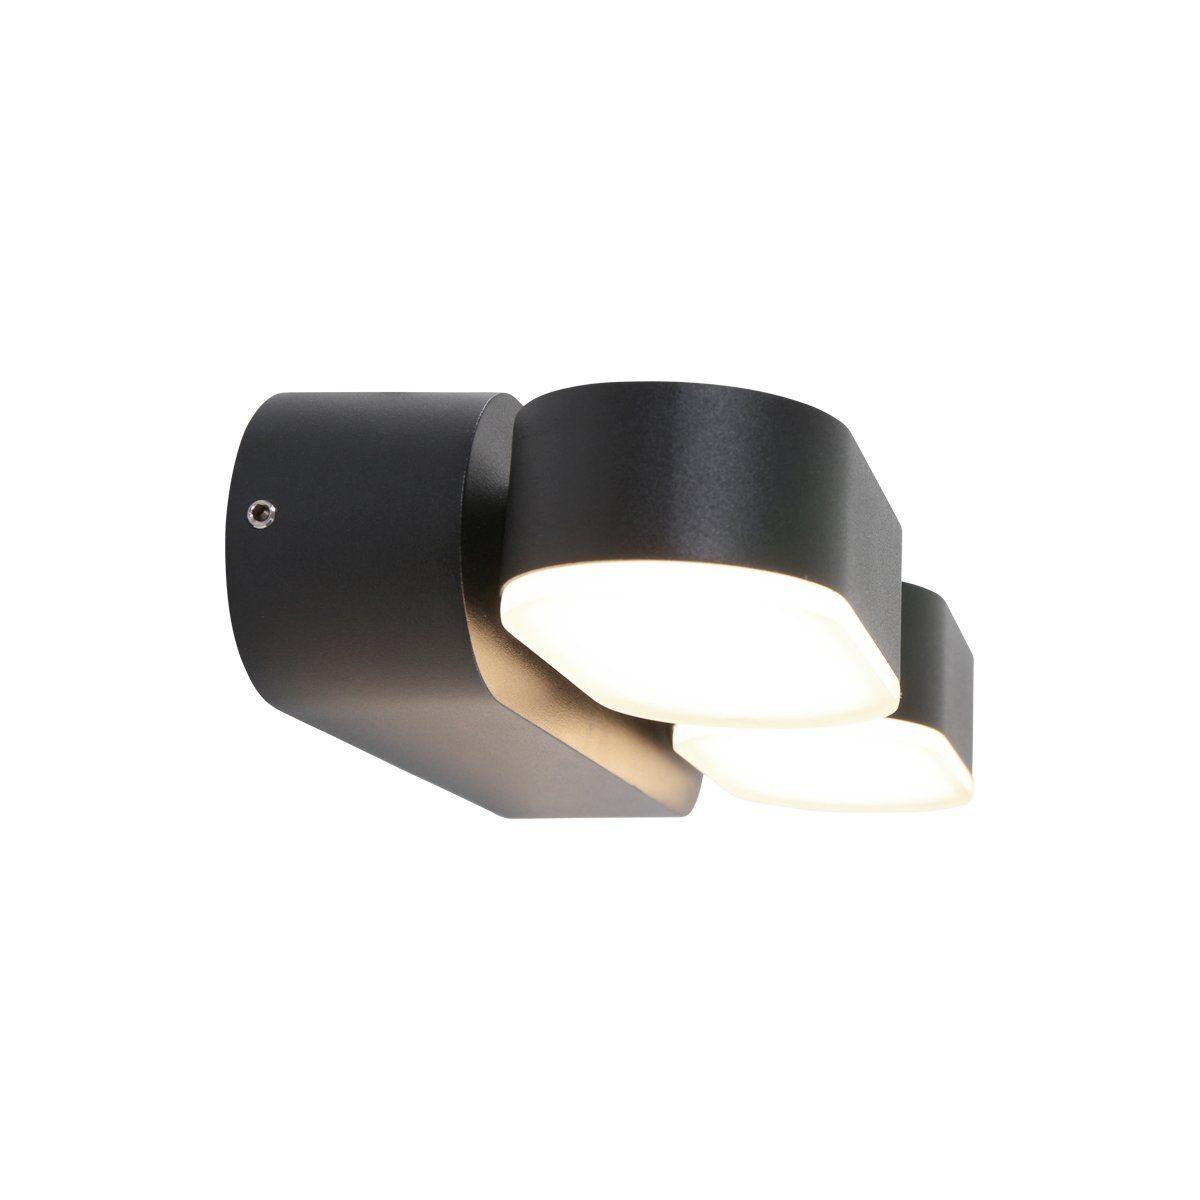 Steinhauer buiten wandlamp Jade 2 lichts - zwart